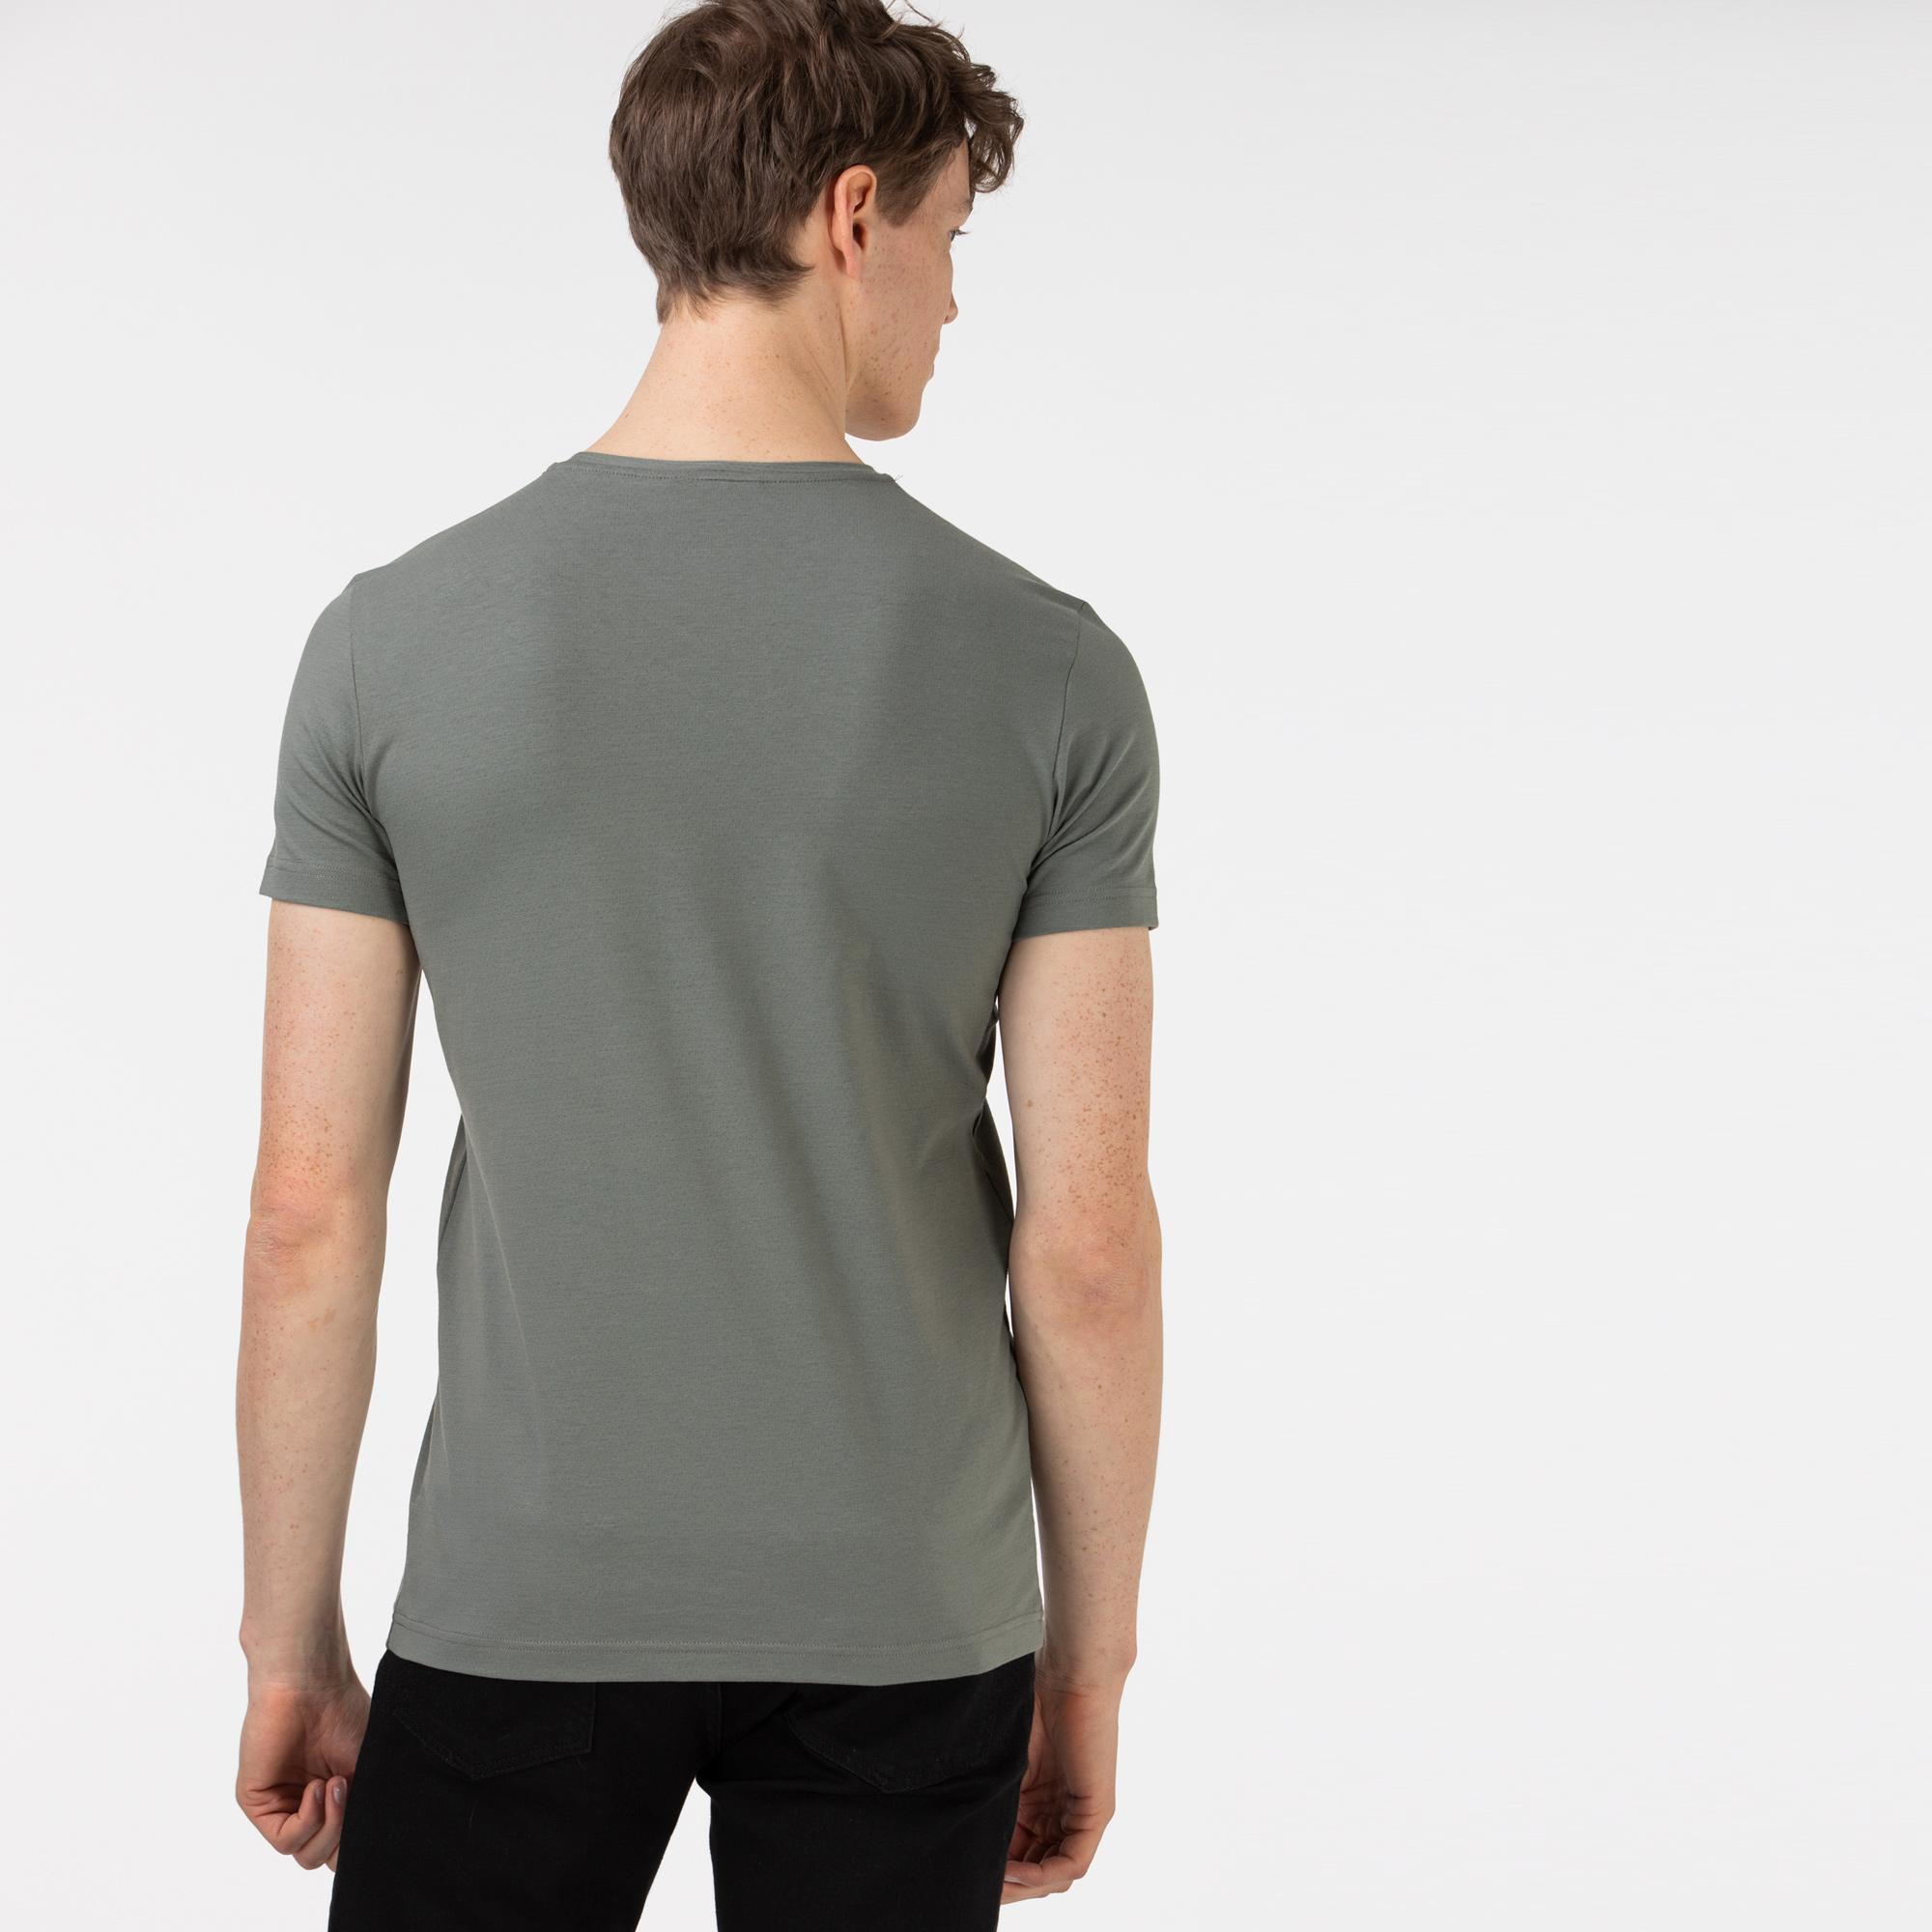 Lacoste Men's Round Neck Patterned T-Shirt